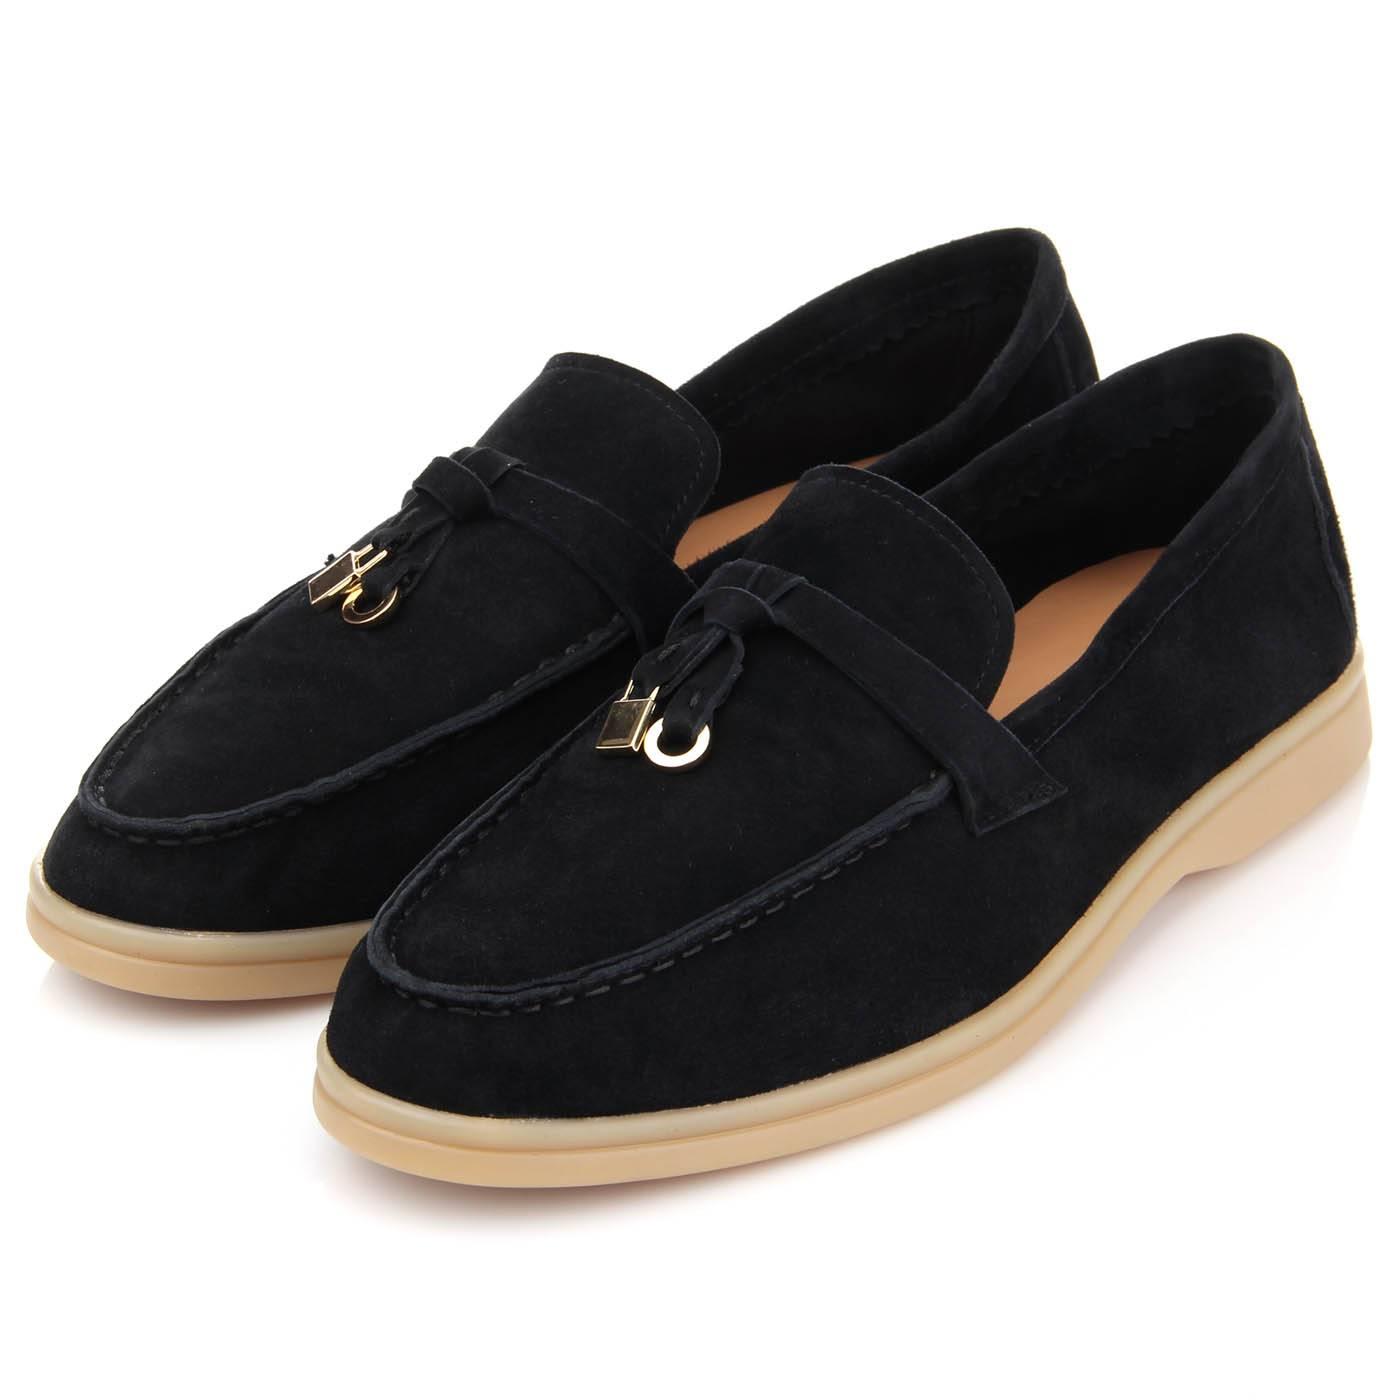 Туфлі жіночі ditto 6389 Чорний купить по выгодной цене в интернет ... 1312ffd84533f